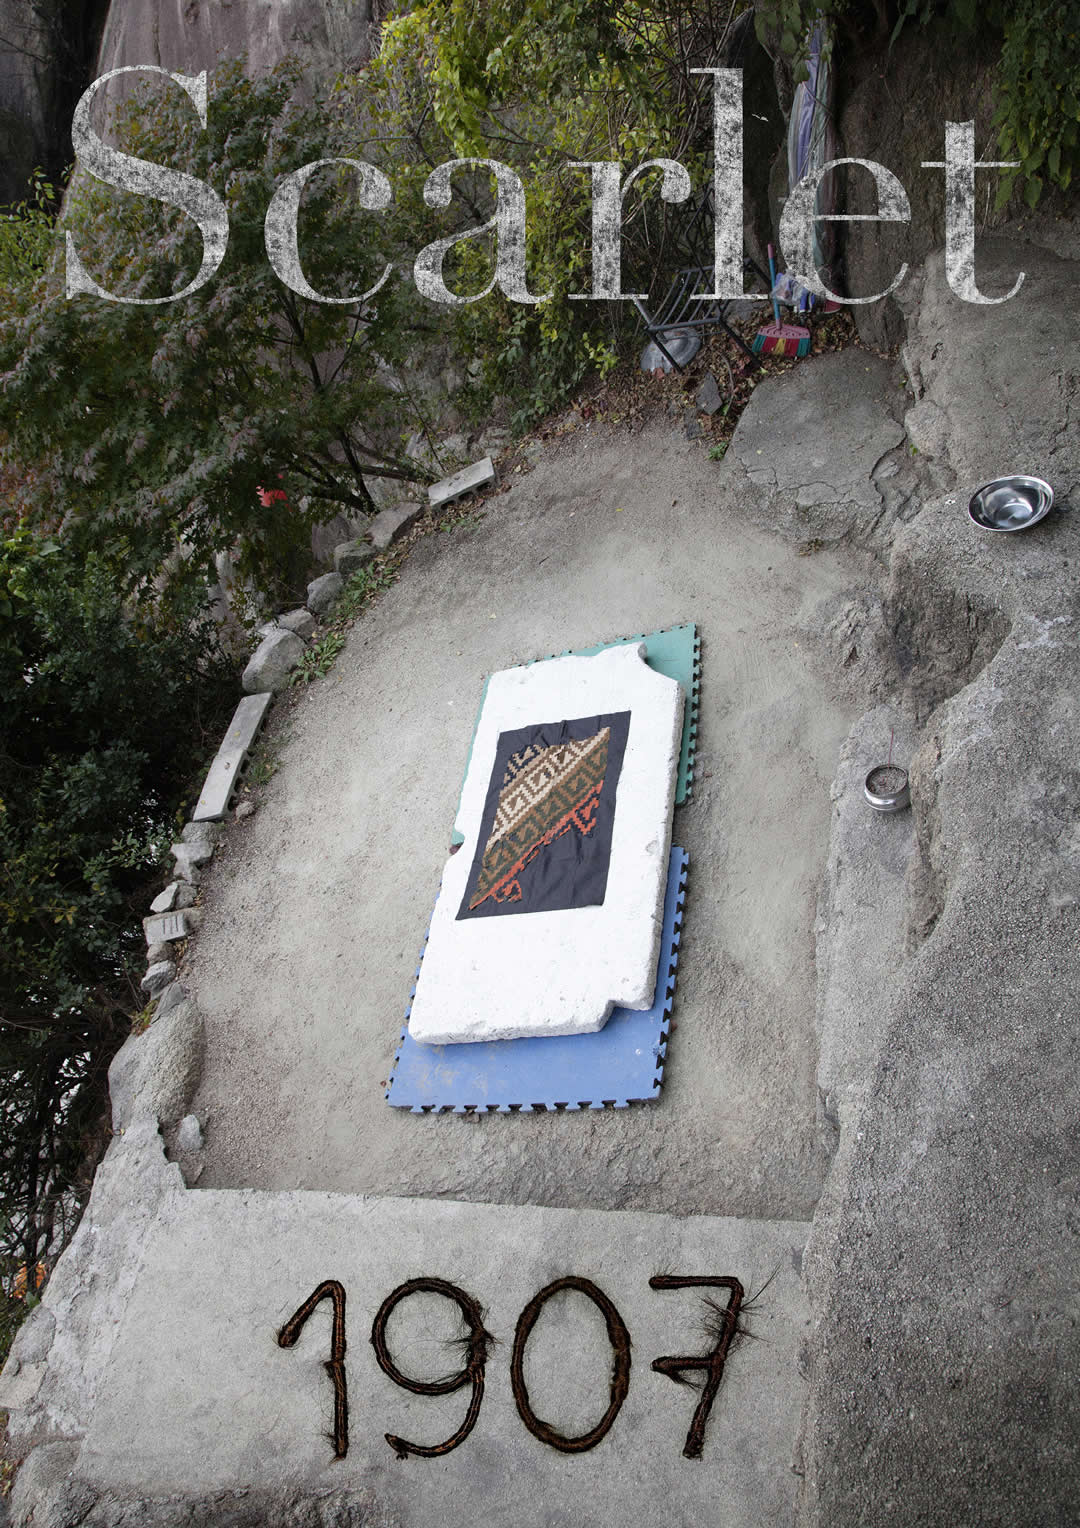 Ines Doujak | Loomshuttles, Warpaths | WK Kartei 1907 Scarlet | A4 | viennacontemporary | Galerie3